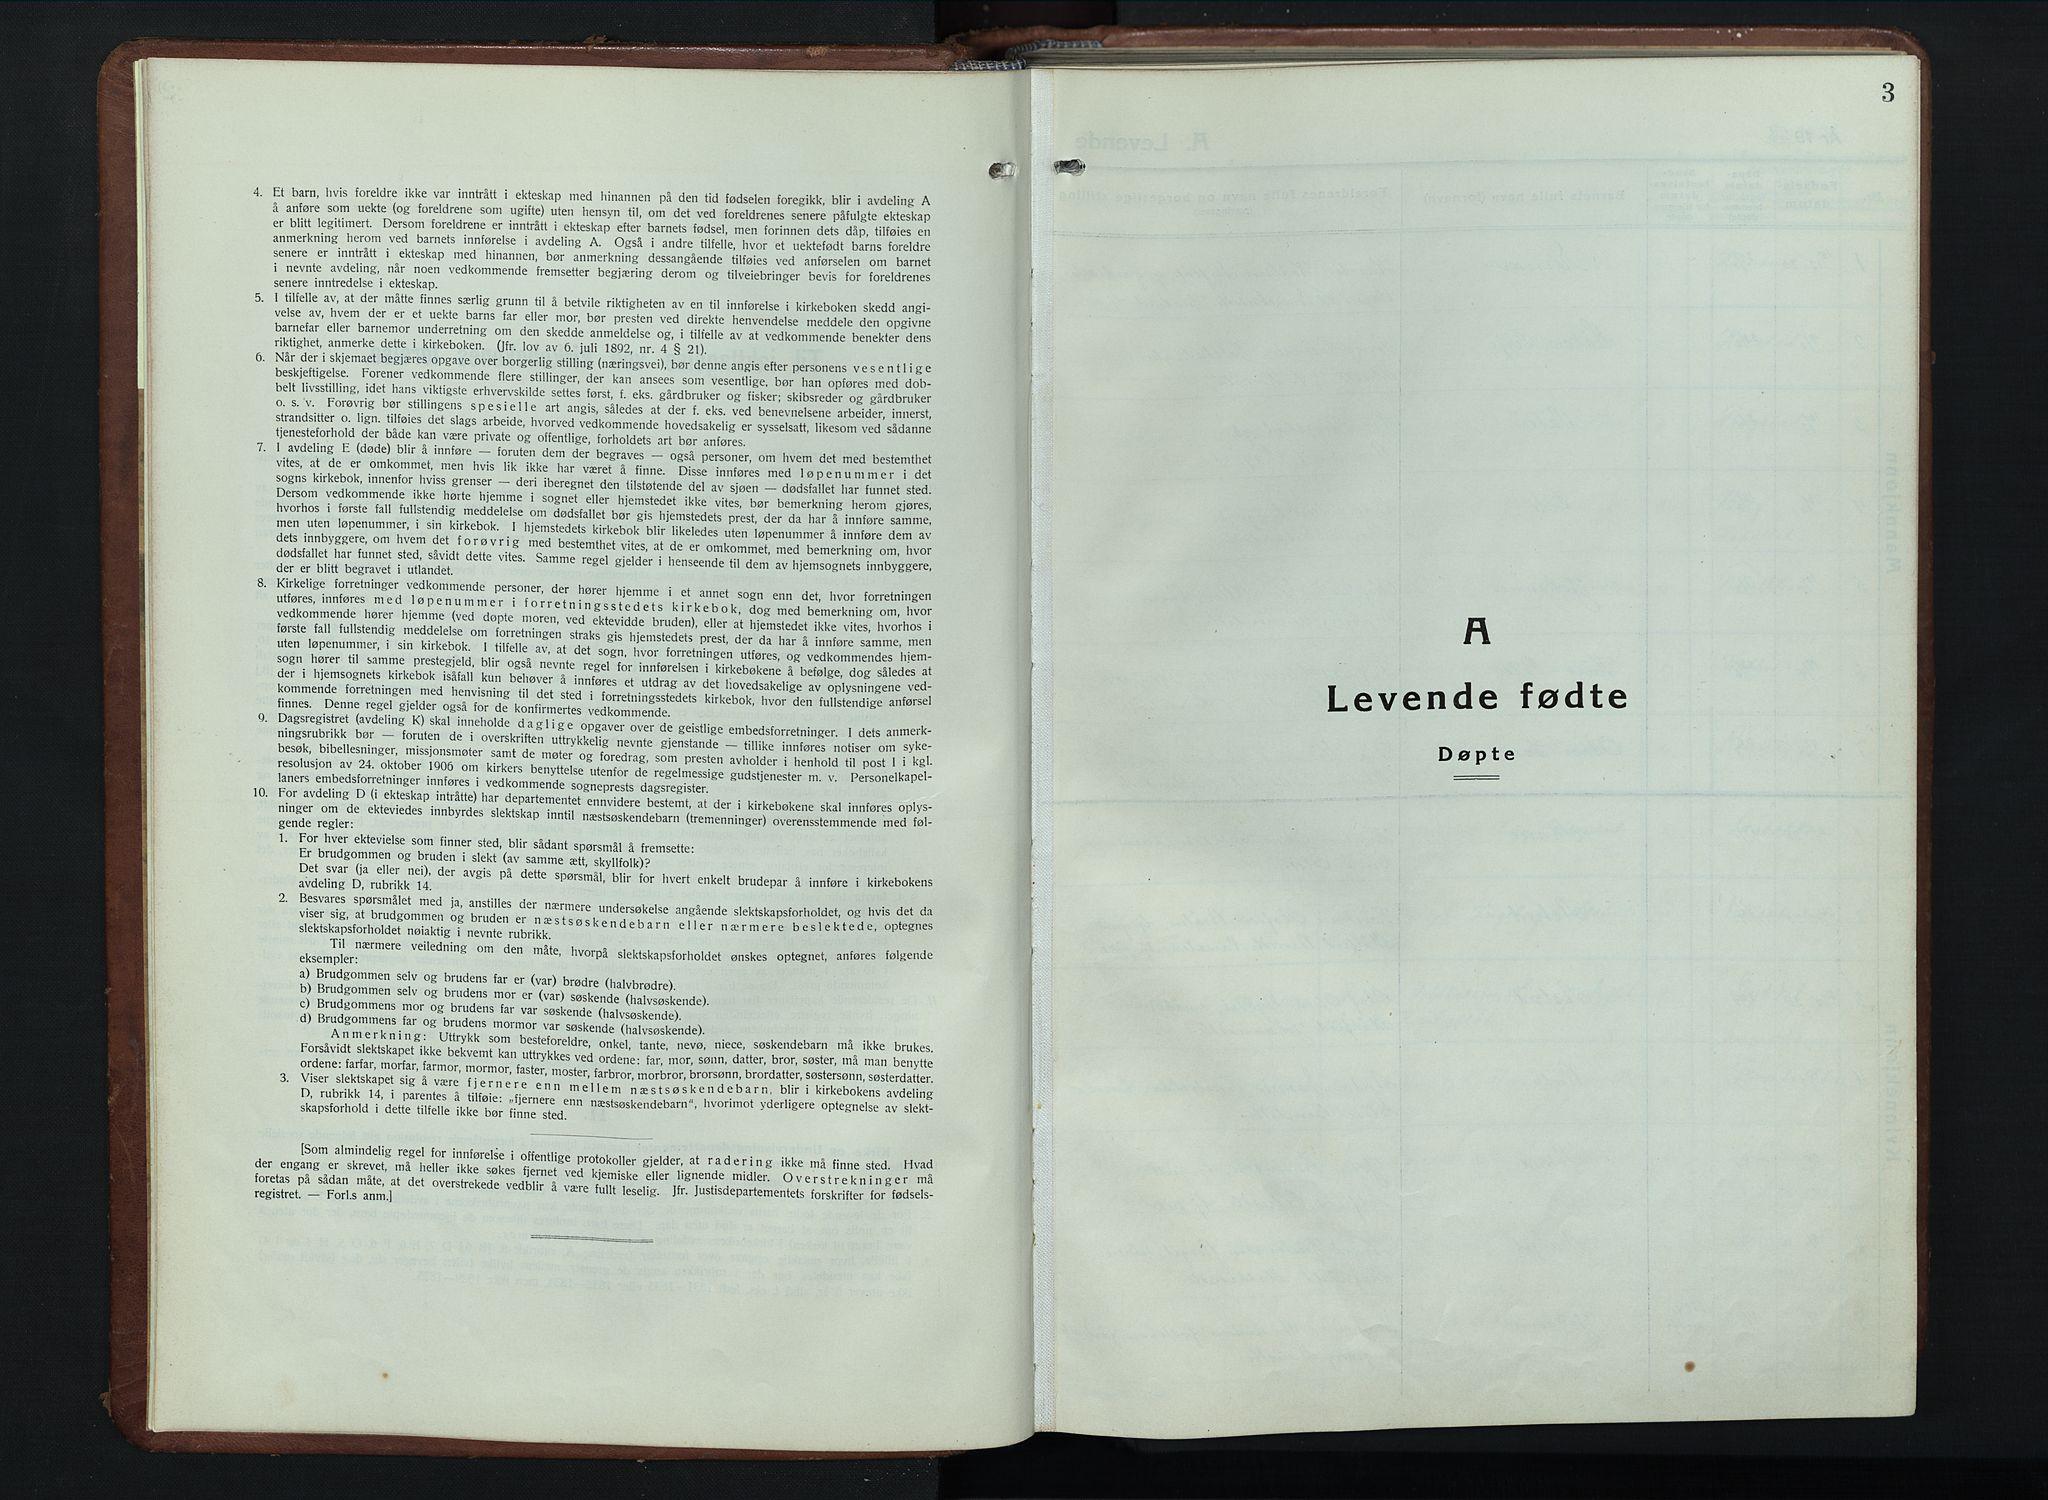 SAH, Vestre Gausdal prestekontor, Klokkerbok nr. 5, 1926-1955, s. 3